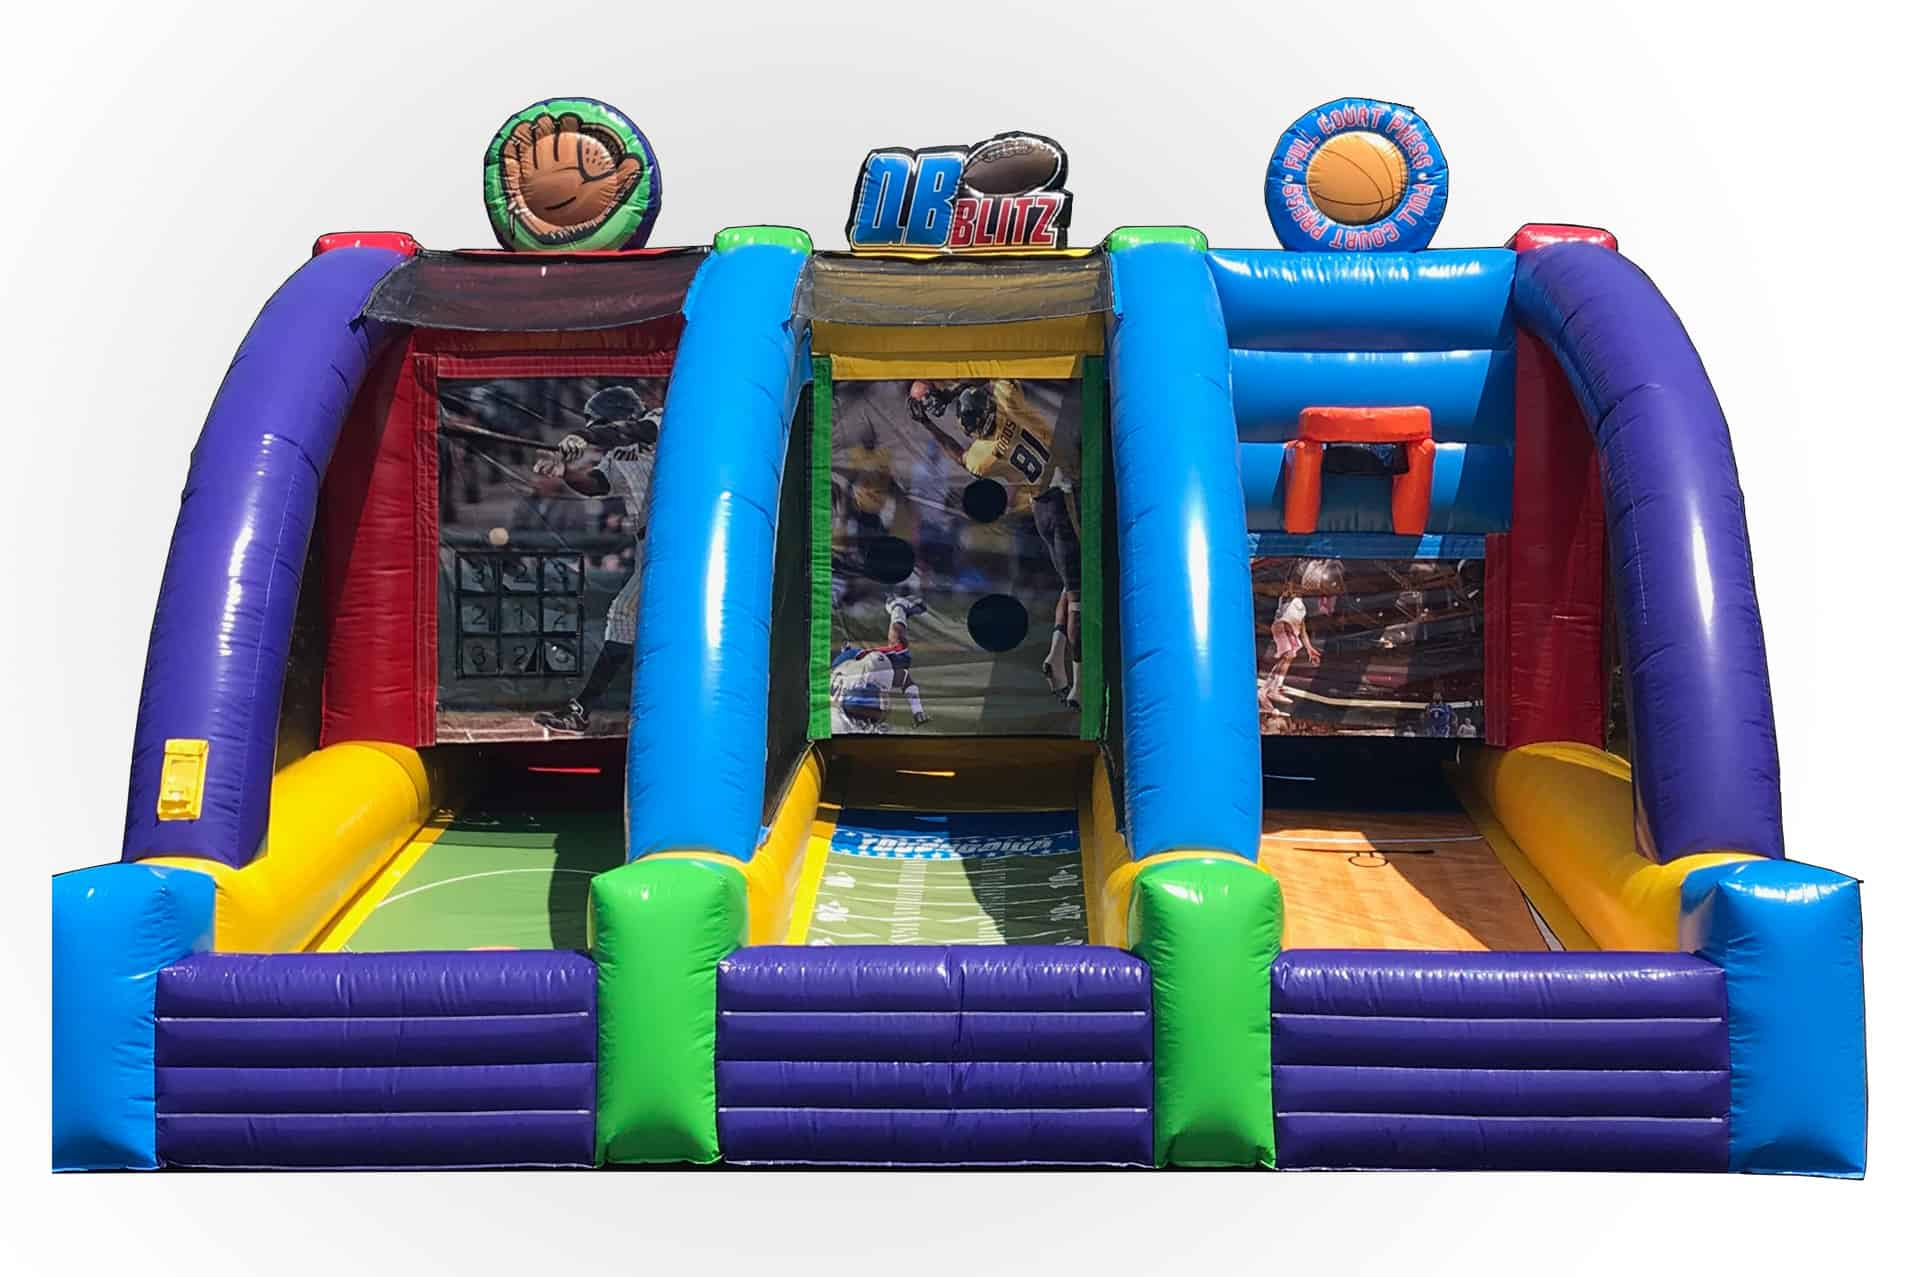 Inflatable Game Rentals Nashville TN